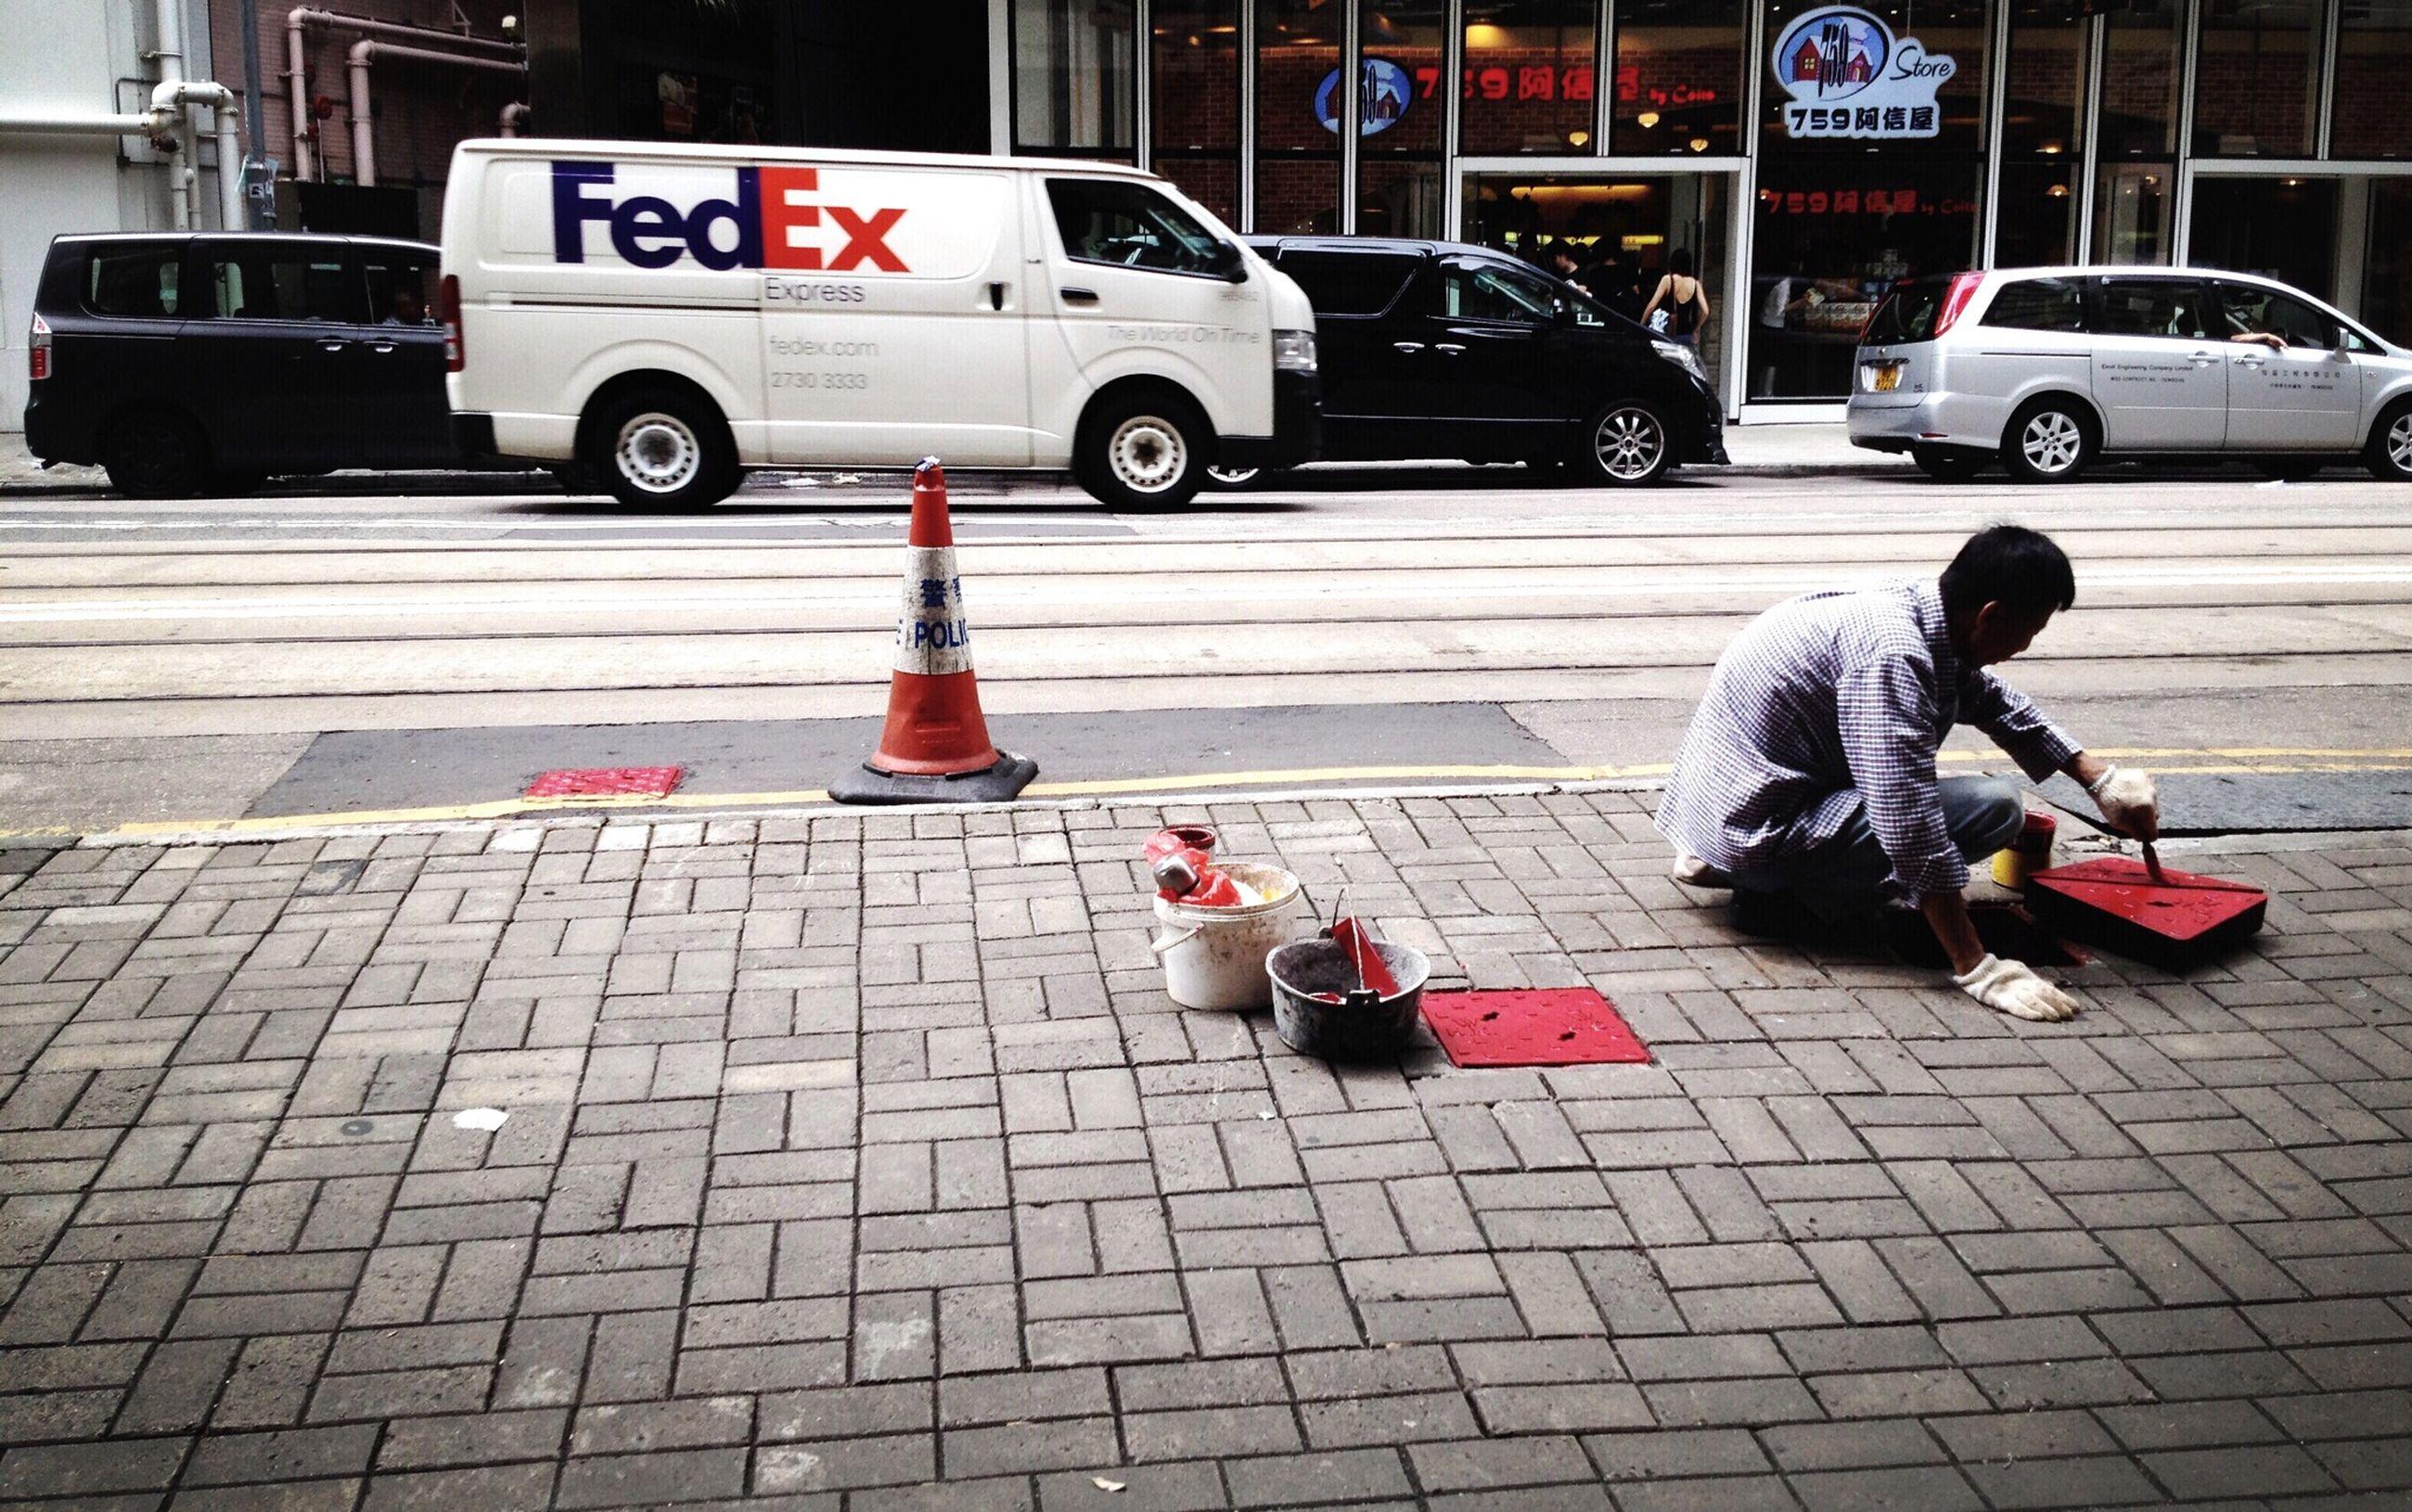 transportation, street, mode of transport, land vehicle, city, car, text, incidental people, sidewalk, building exterior, city life, communication, cobblestone, day, outdoors, guidance, men, city street, road